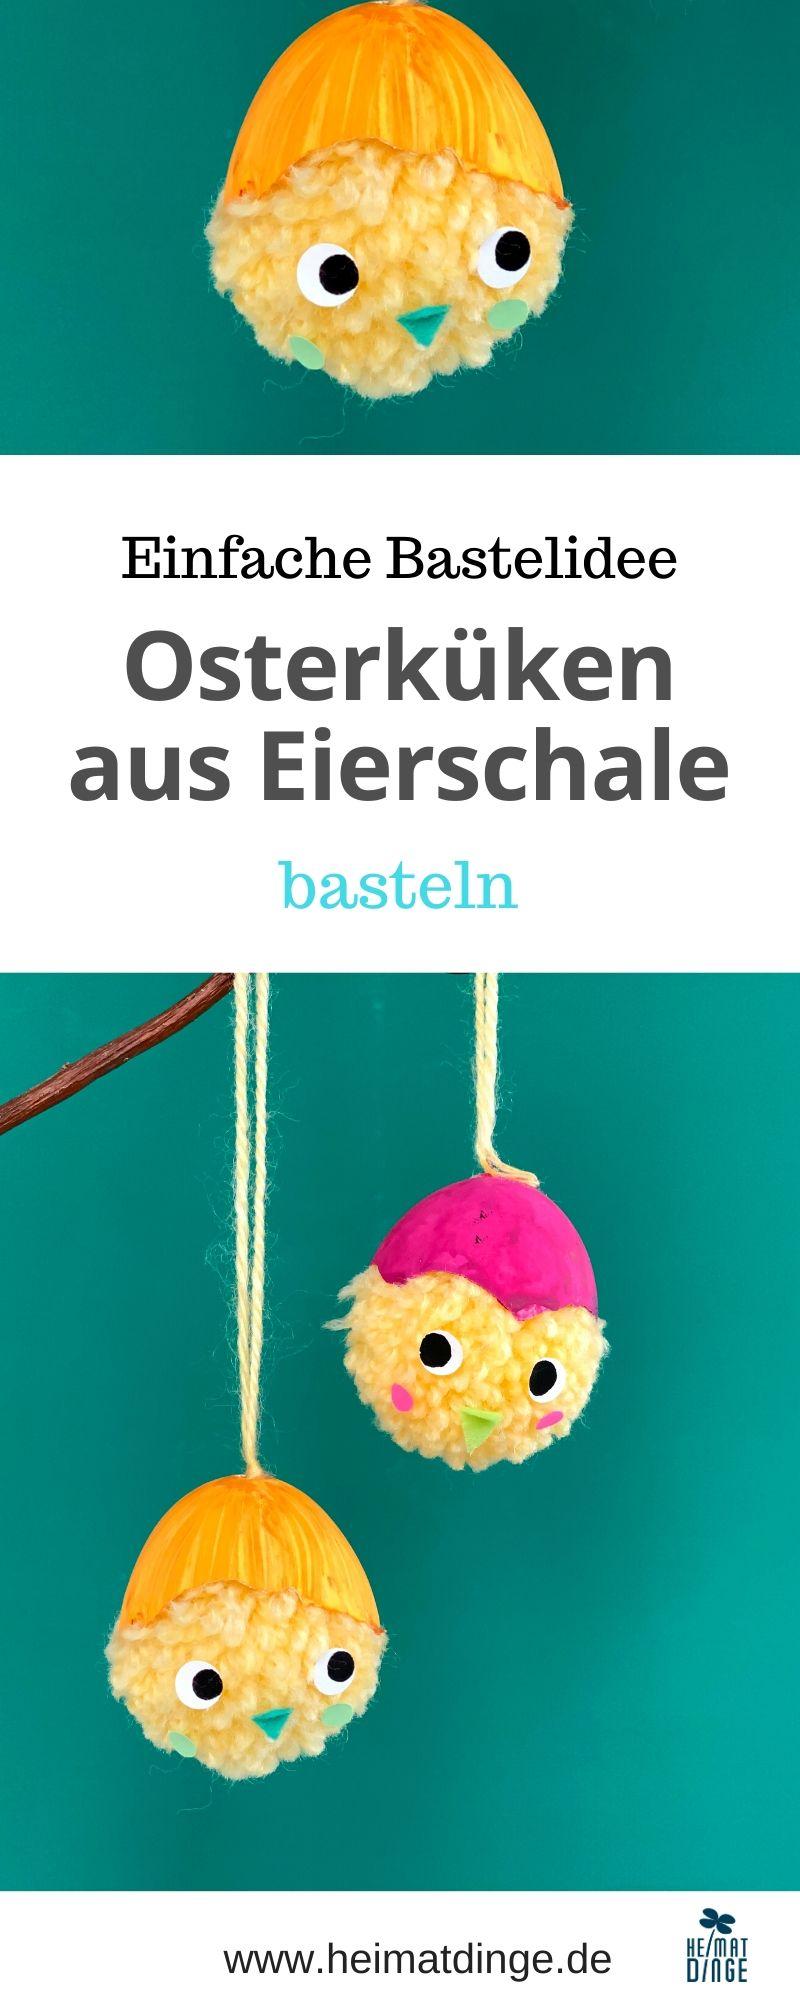 ostern-basteln-mit-kindern-kueken-selbermachen-diy-osterbastelei-idee